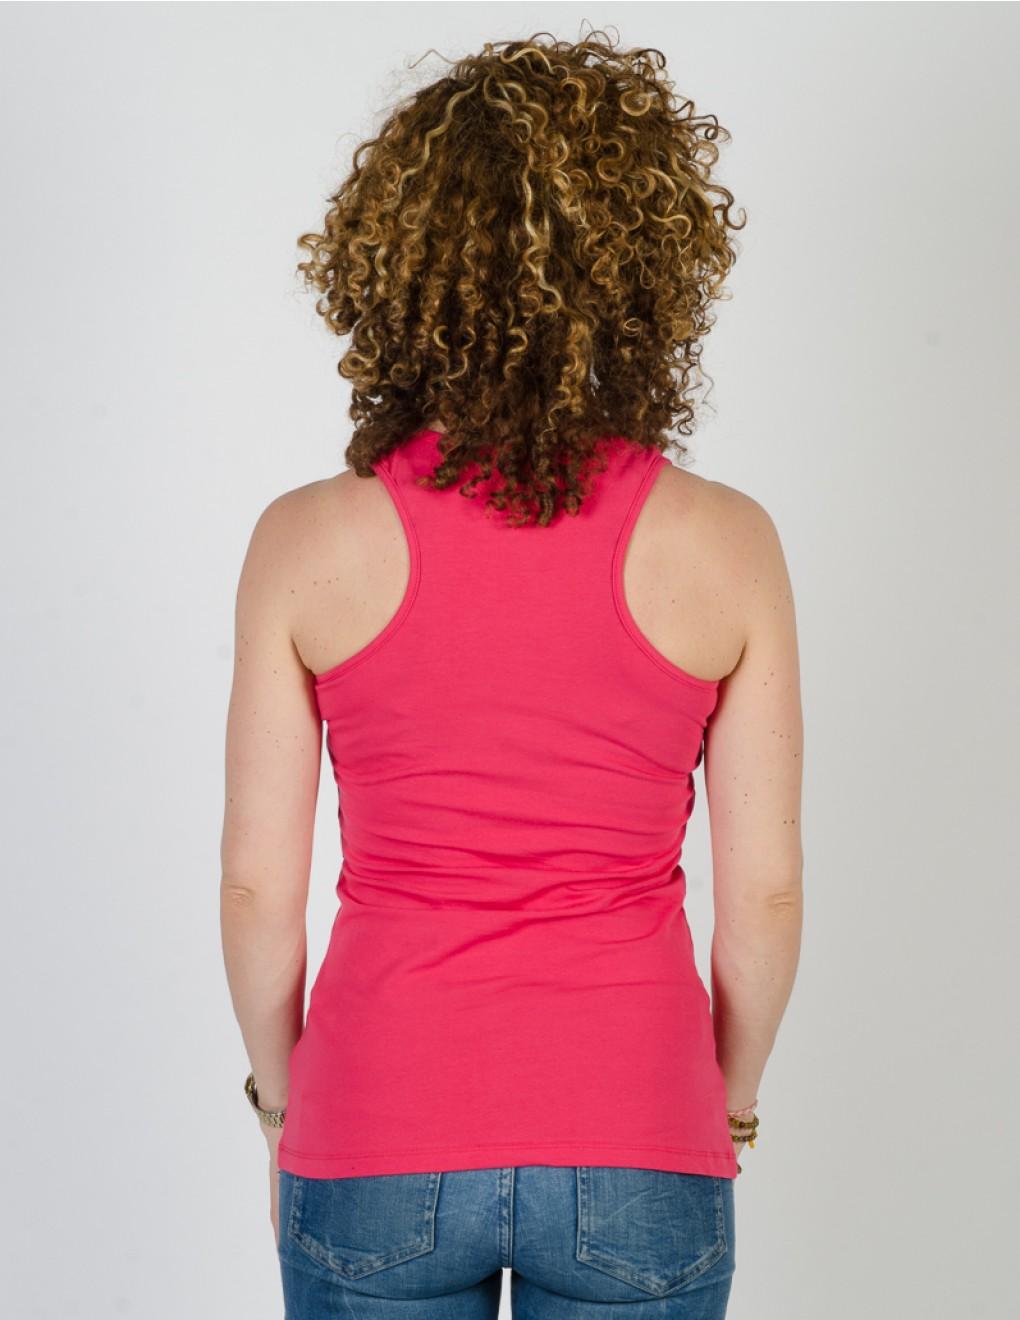 momzelle-betty-nursing-tank-pink-back